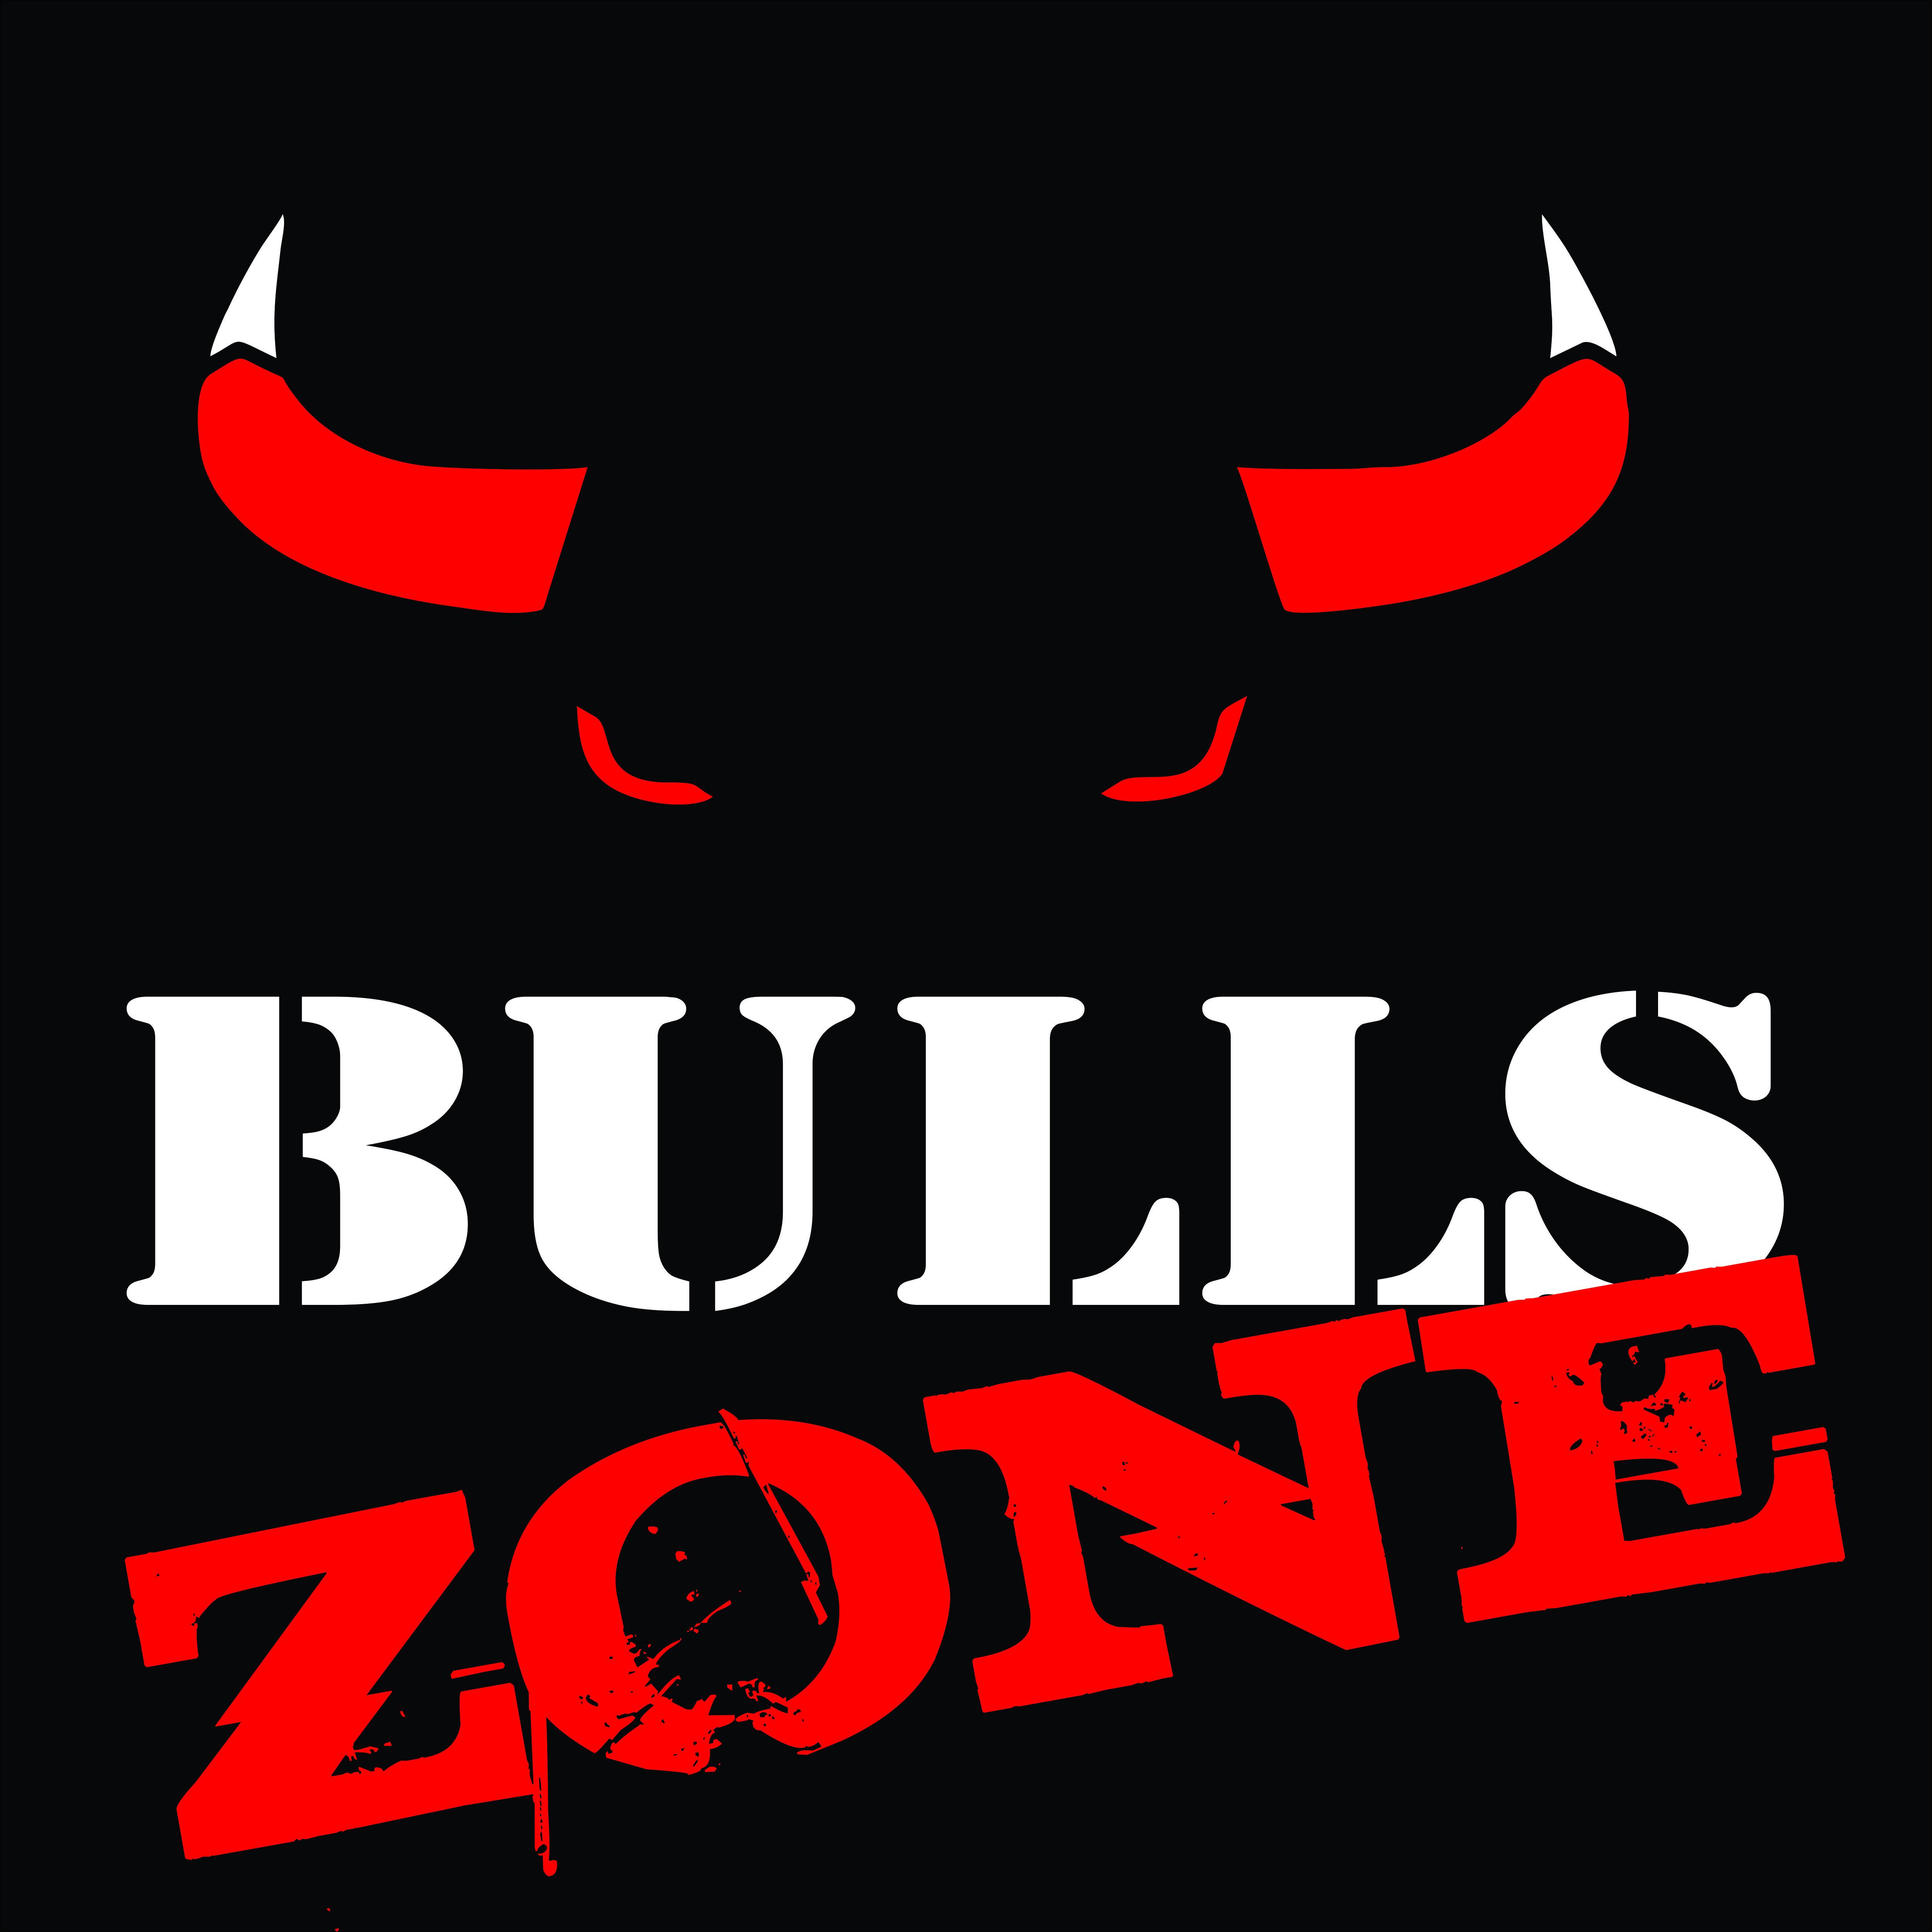 Bull clipart beast. Free bulls download clip